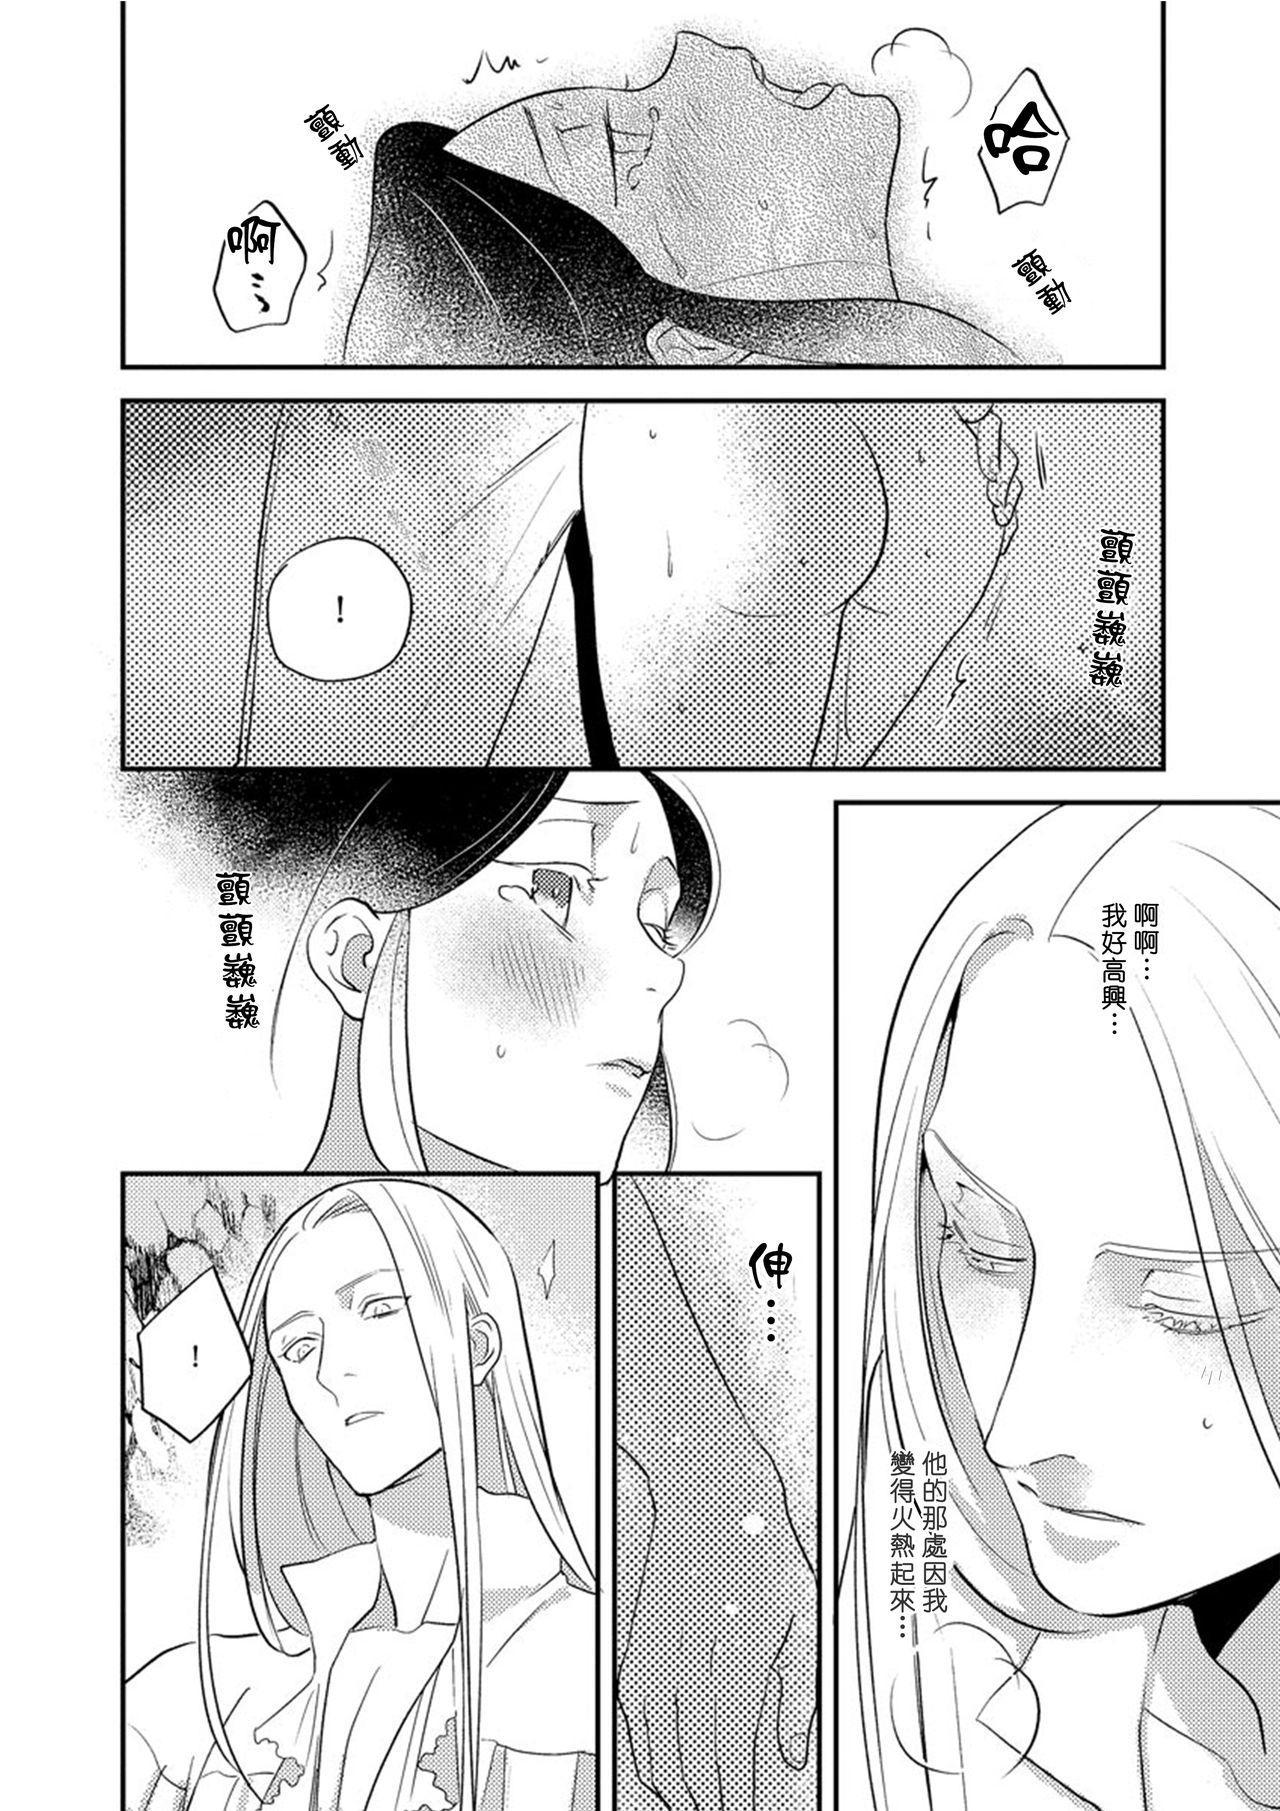 Oeyama suimutan utsukushiki oni no toraware hime | 大江山醉夢逸話 美麗的鬼與被囚禁的公主 Ch. 1-8 99